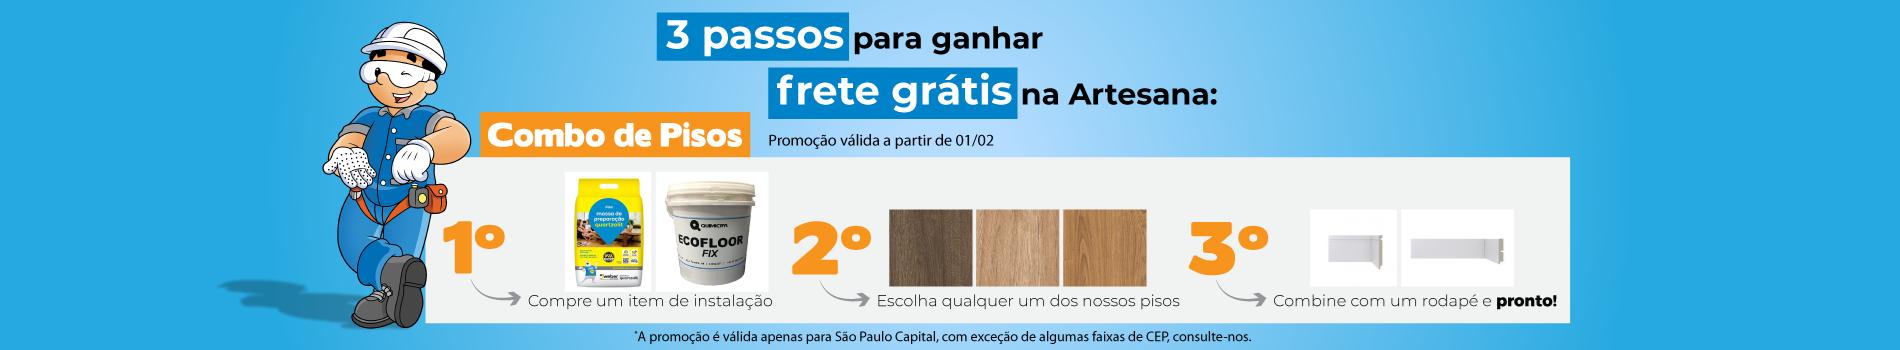 https://www.artesana.com.br/combo-de-pisos-frete-gratis